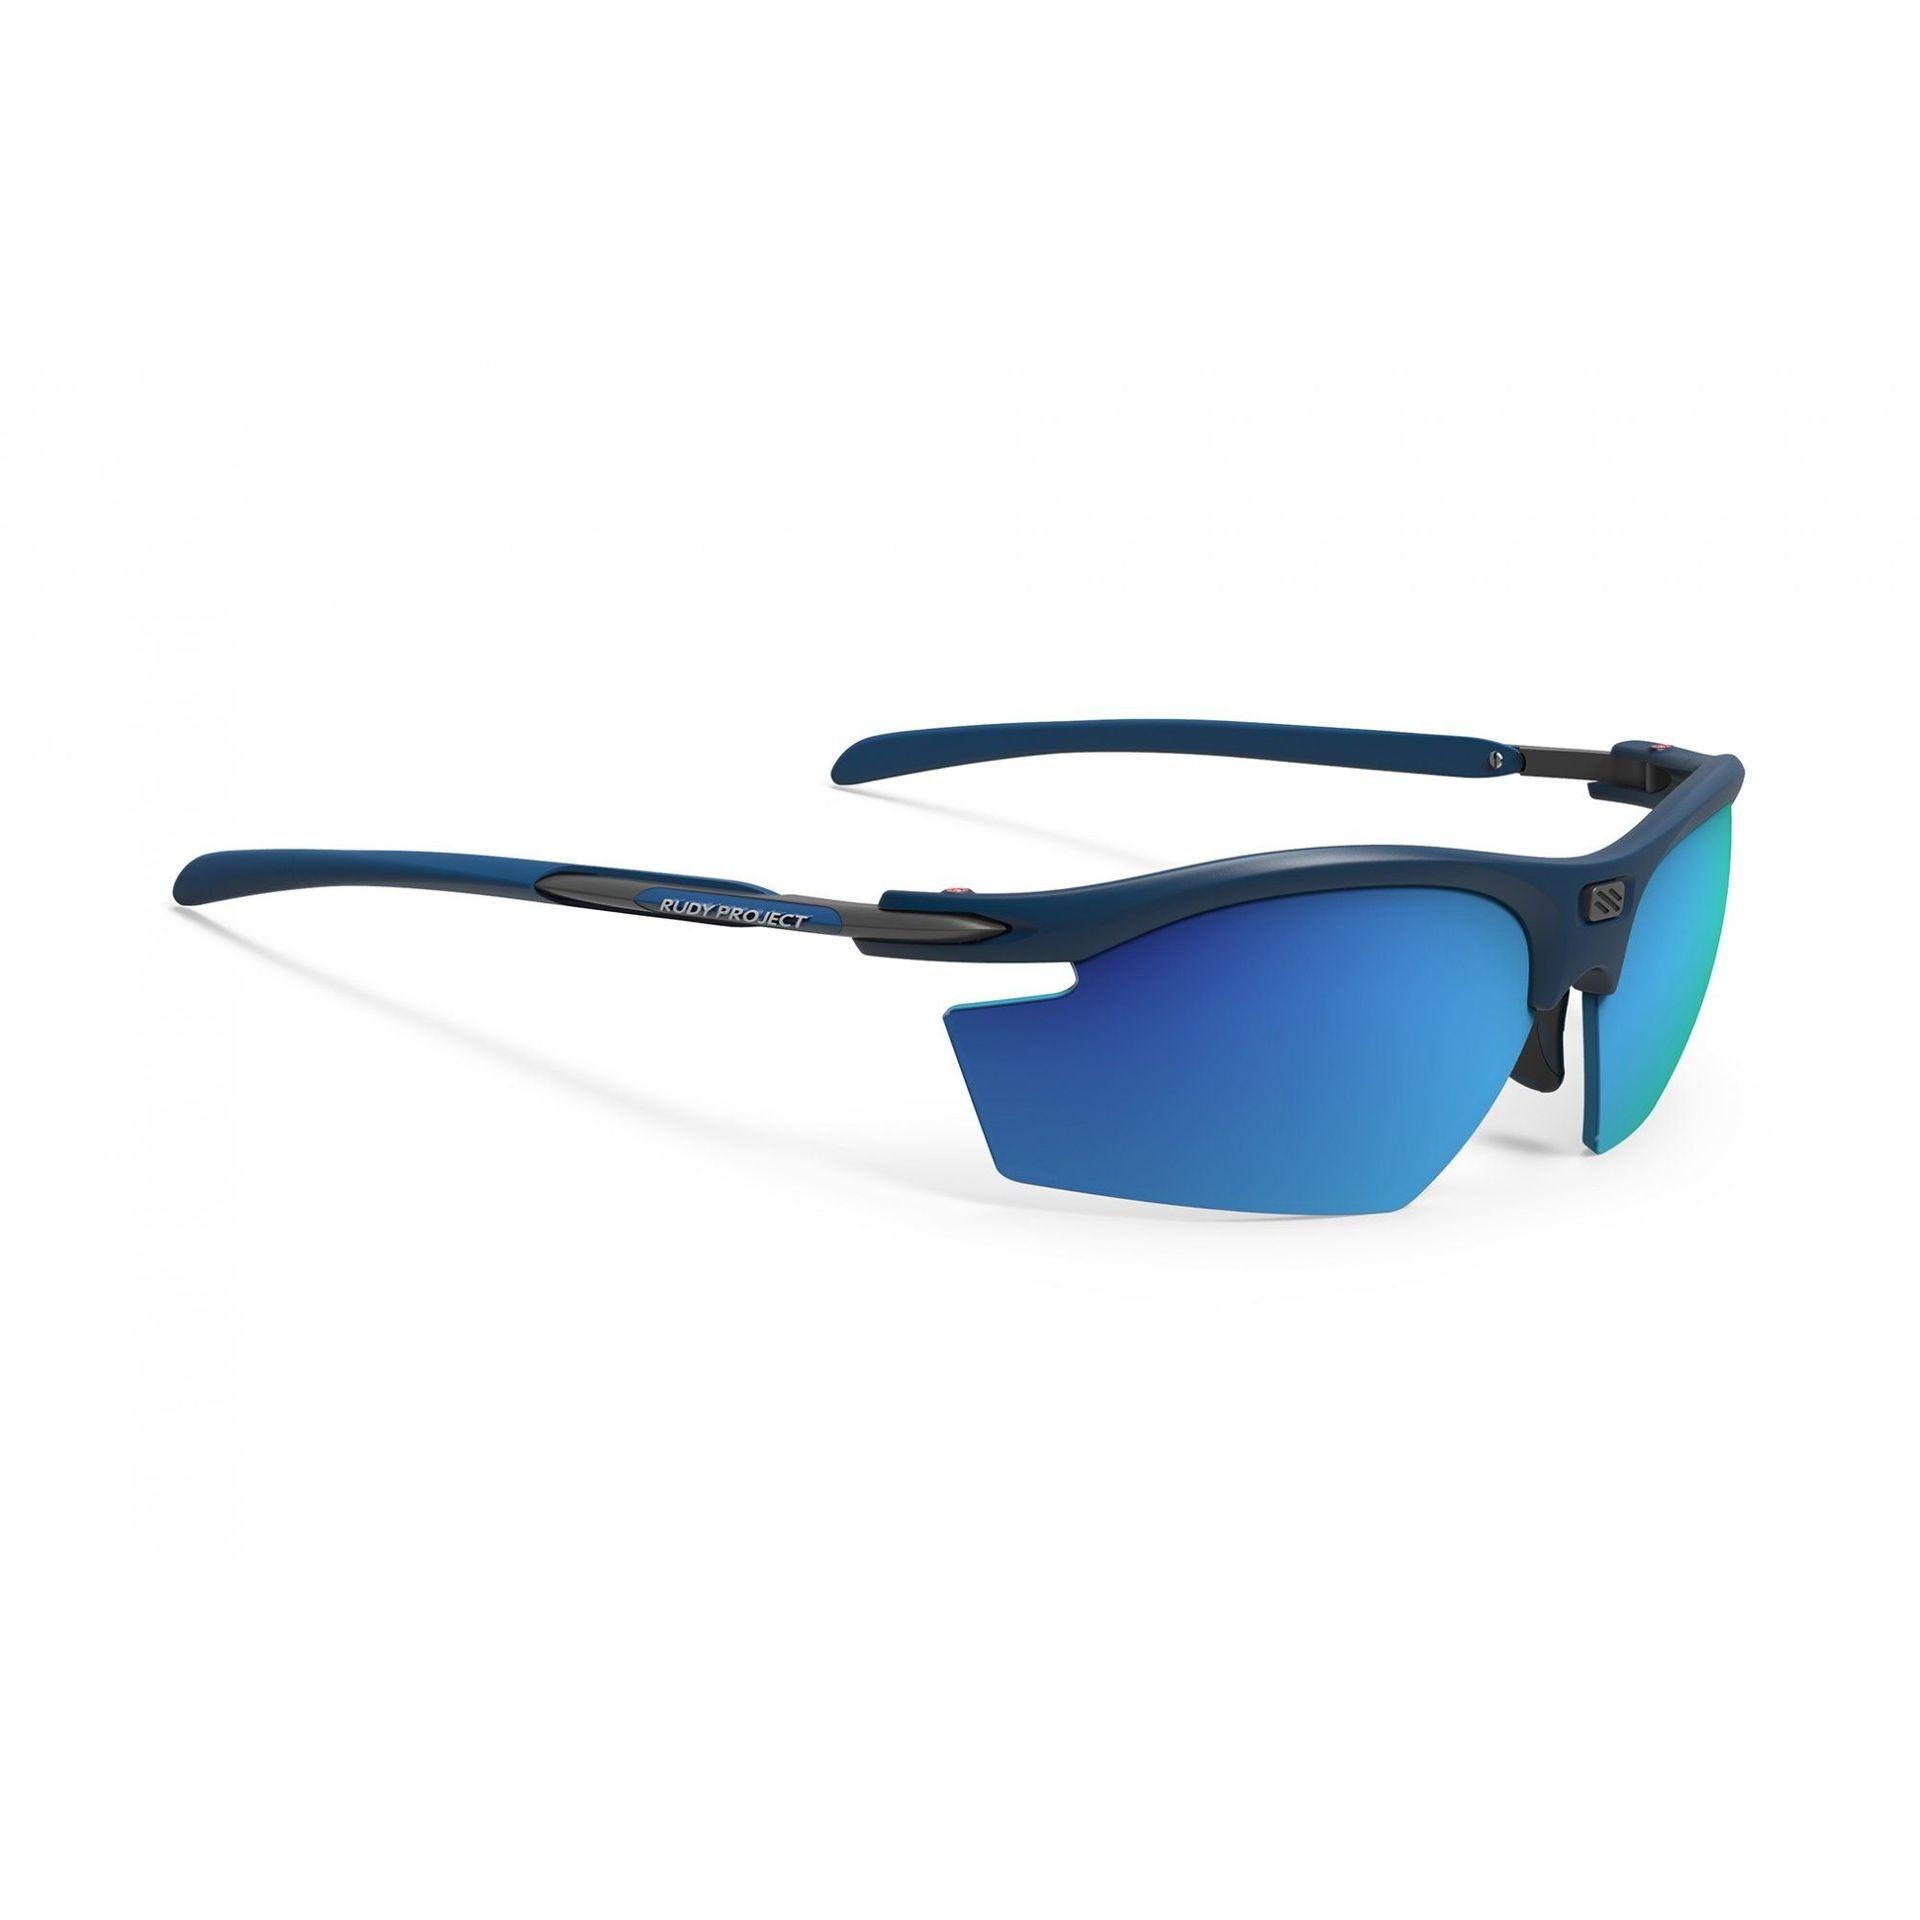 OKULARY RUDY PROJECT RYDON NAVY + ML BLUE SP533947